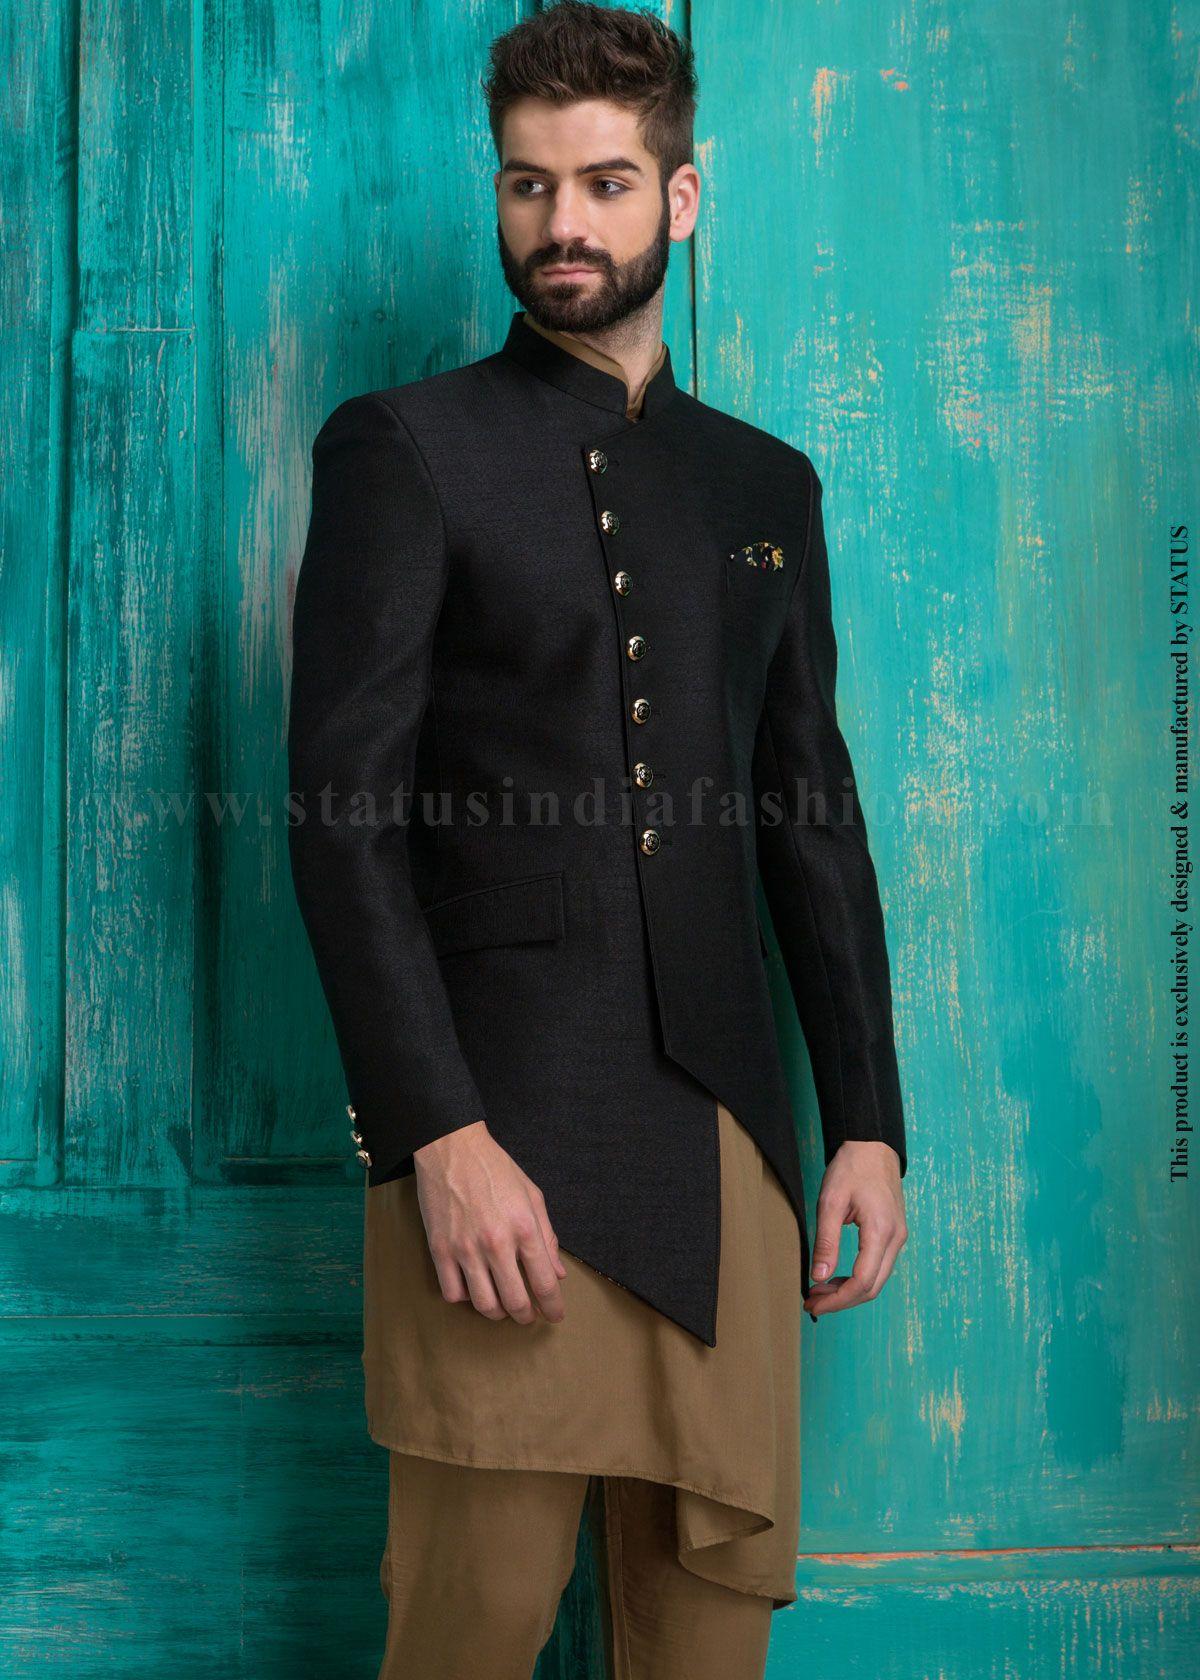 Mens jodhpuri, mens designer jodhpuri, velvet jodhpuri, navy blue ...